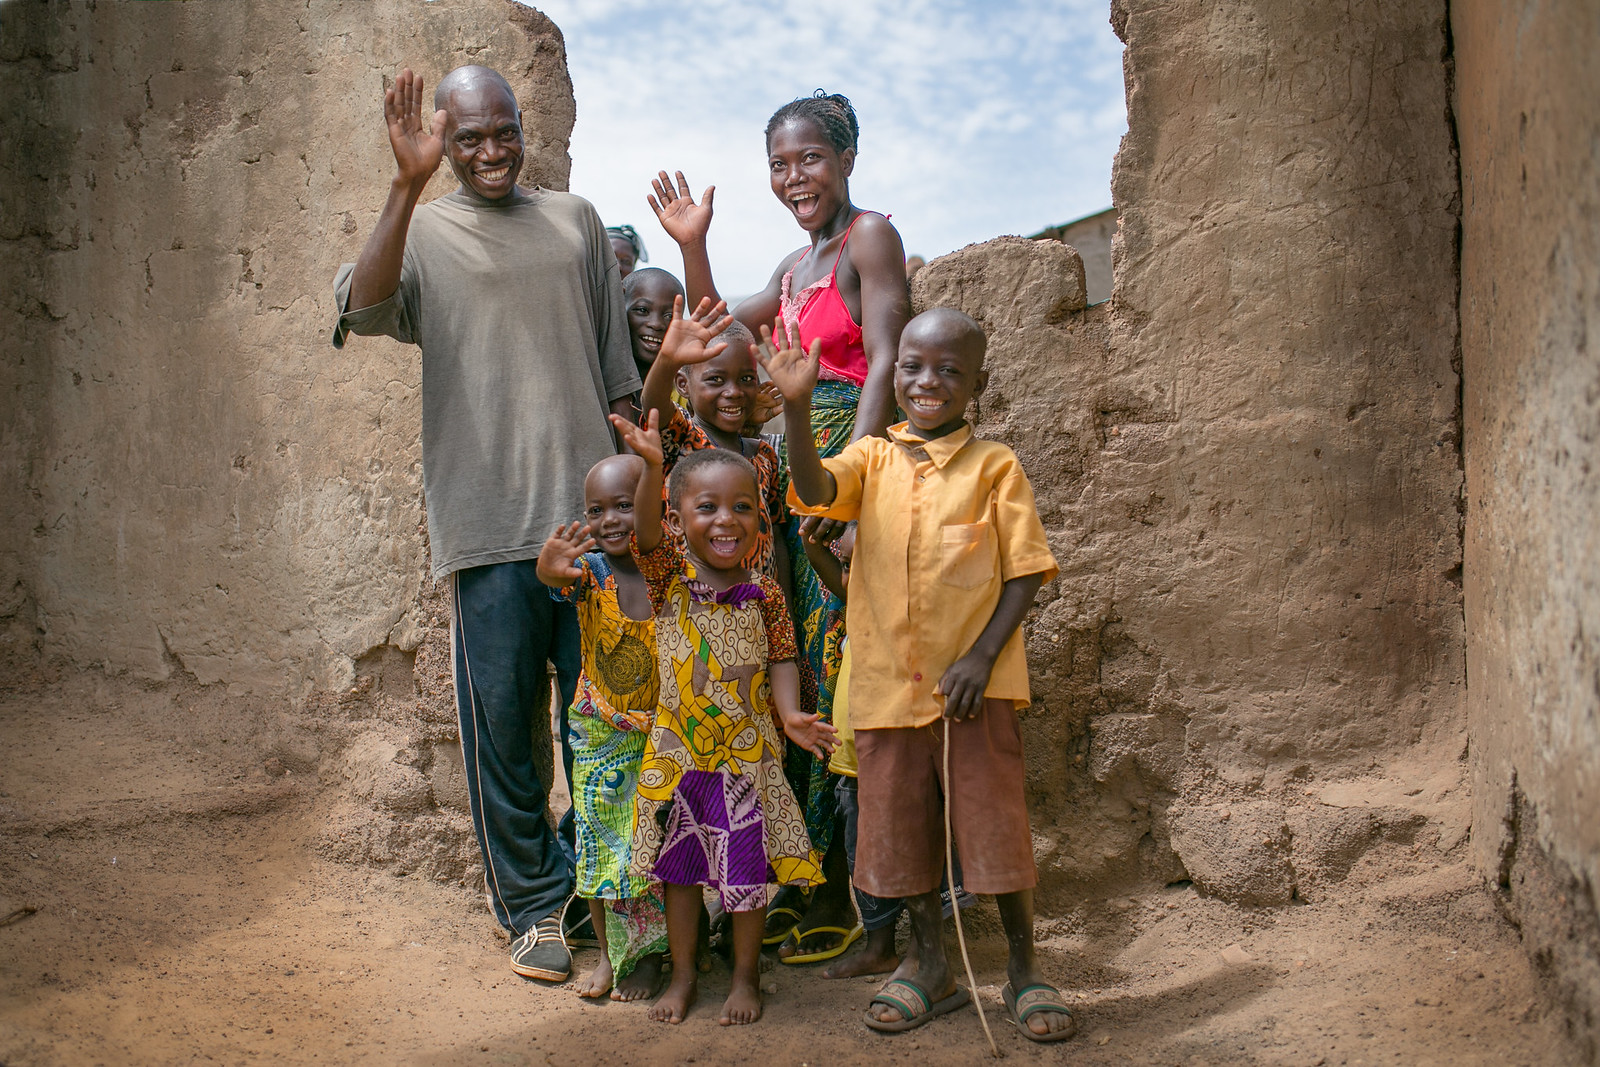 A farmer and his family in northern Ghana. Photo credit: Michael Dakwa